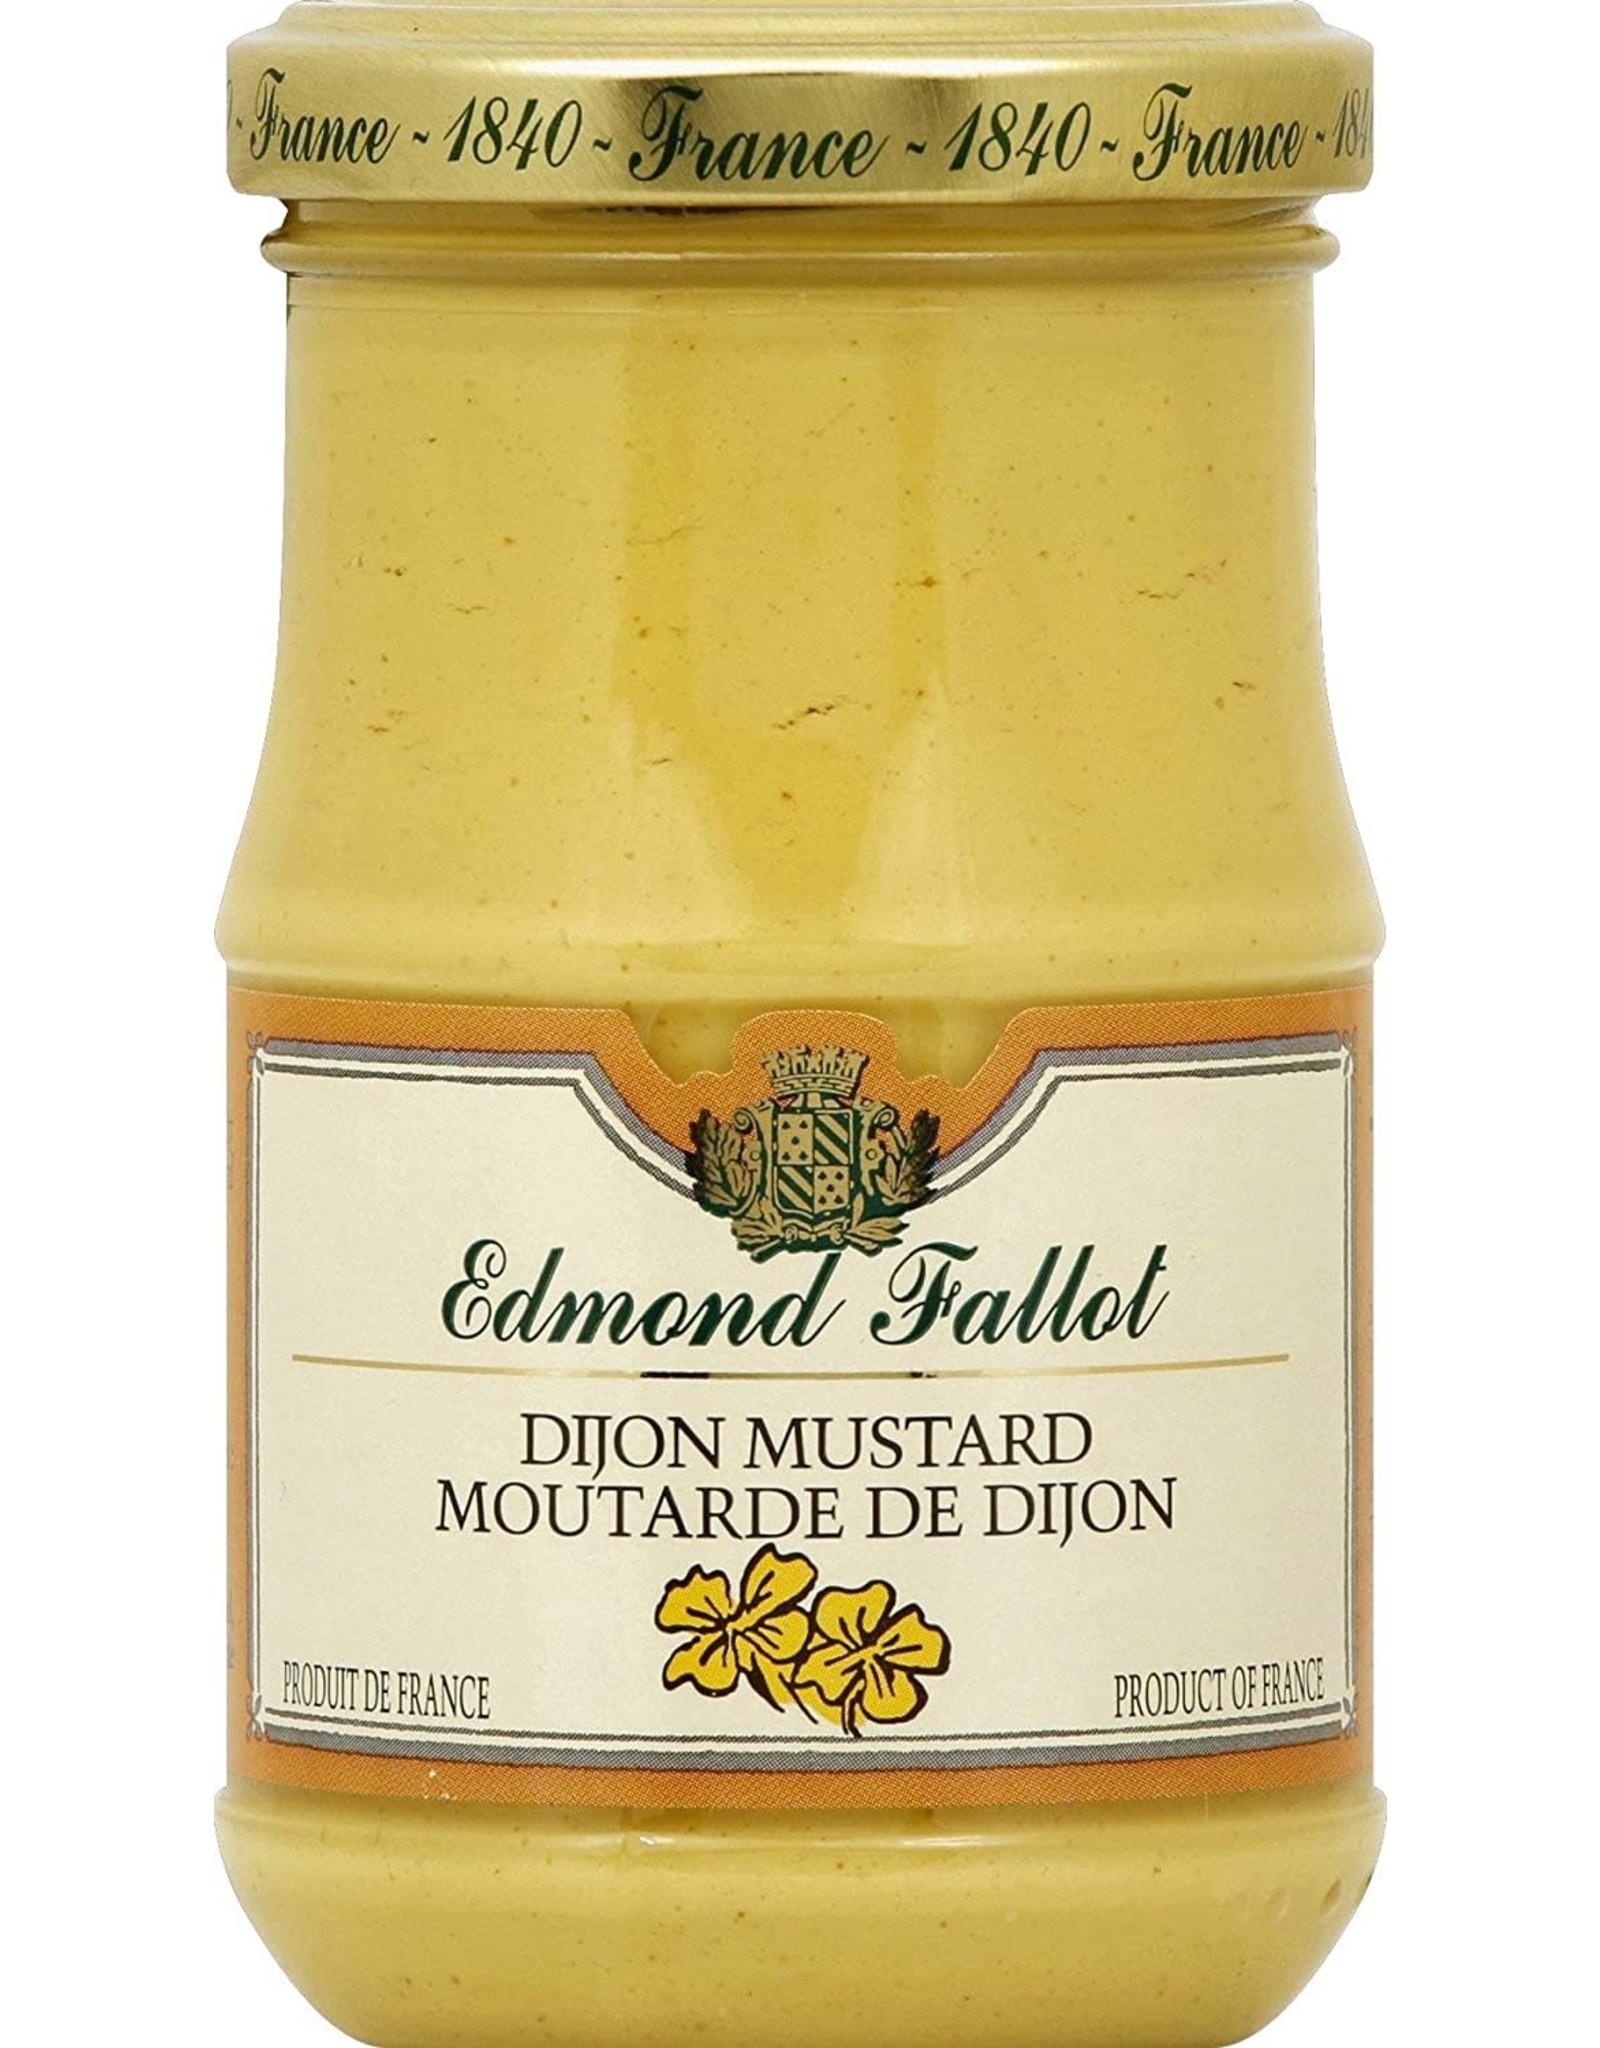 Edmond Fallot Edmond Fallot Dijon Mustard